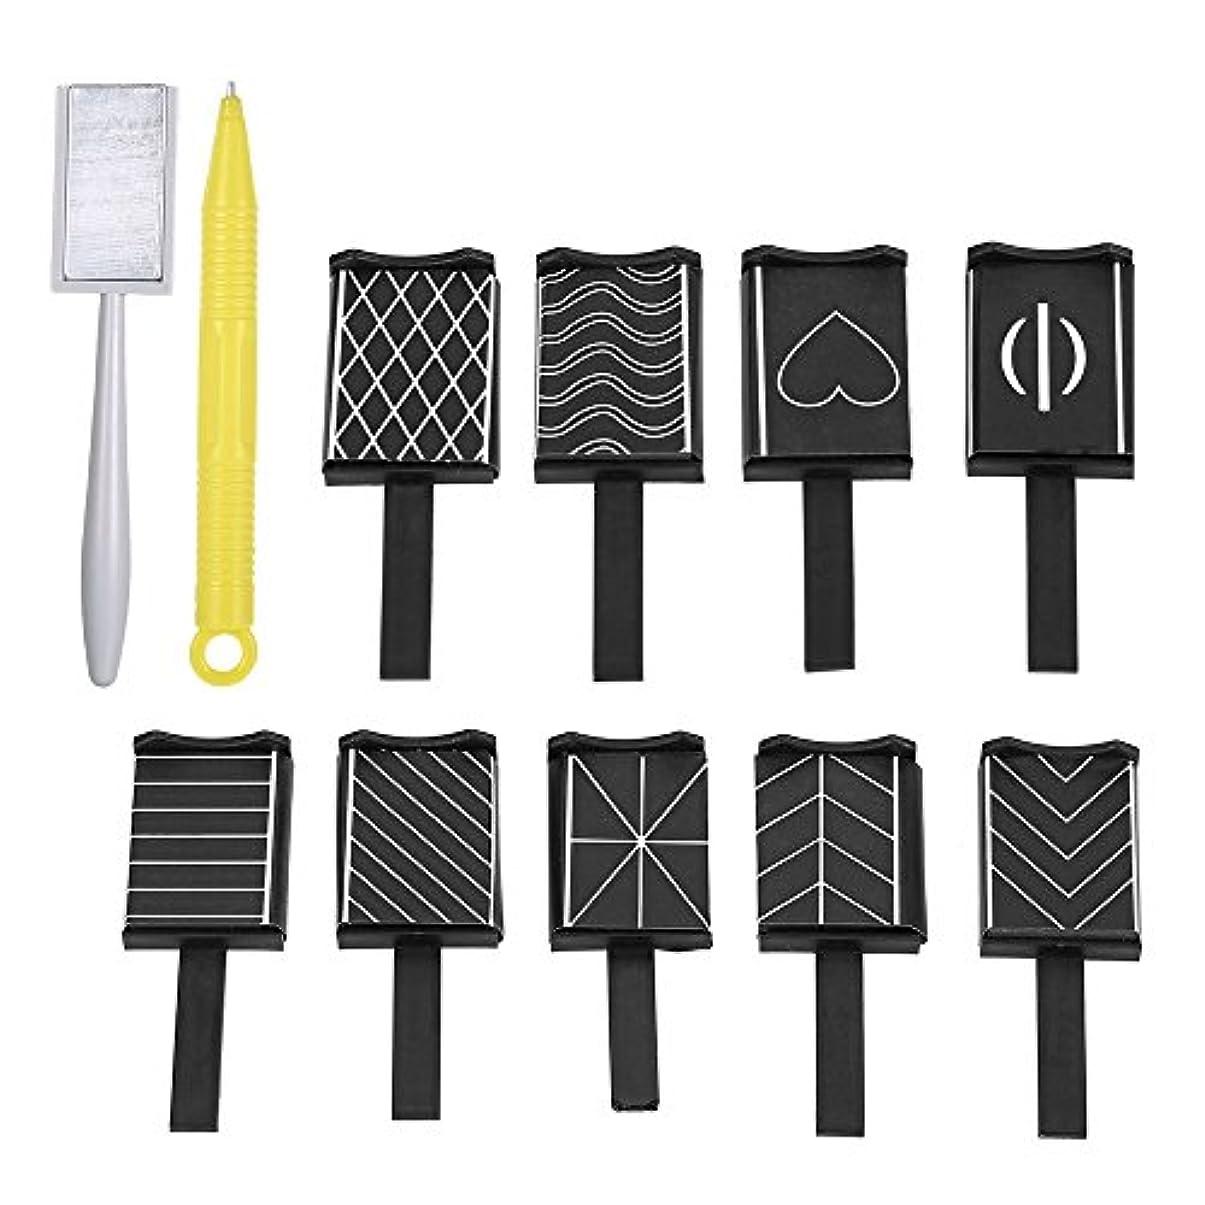 11 Pieces/set 3D Nail Art Magnet Stick Cat Eye Effect UV Nail Gel Polish Drawing Magnetic Vertical Stick Pen